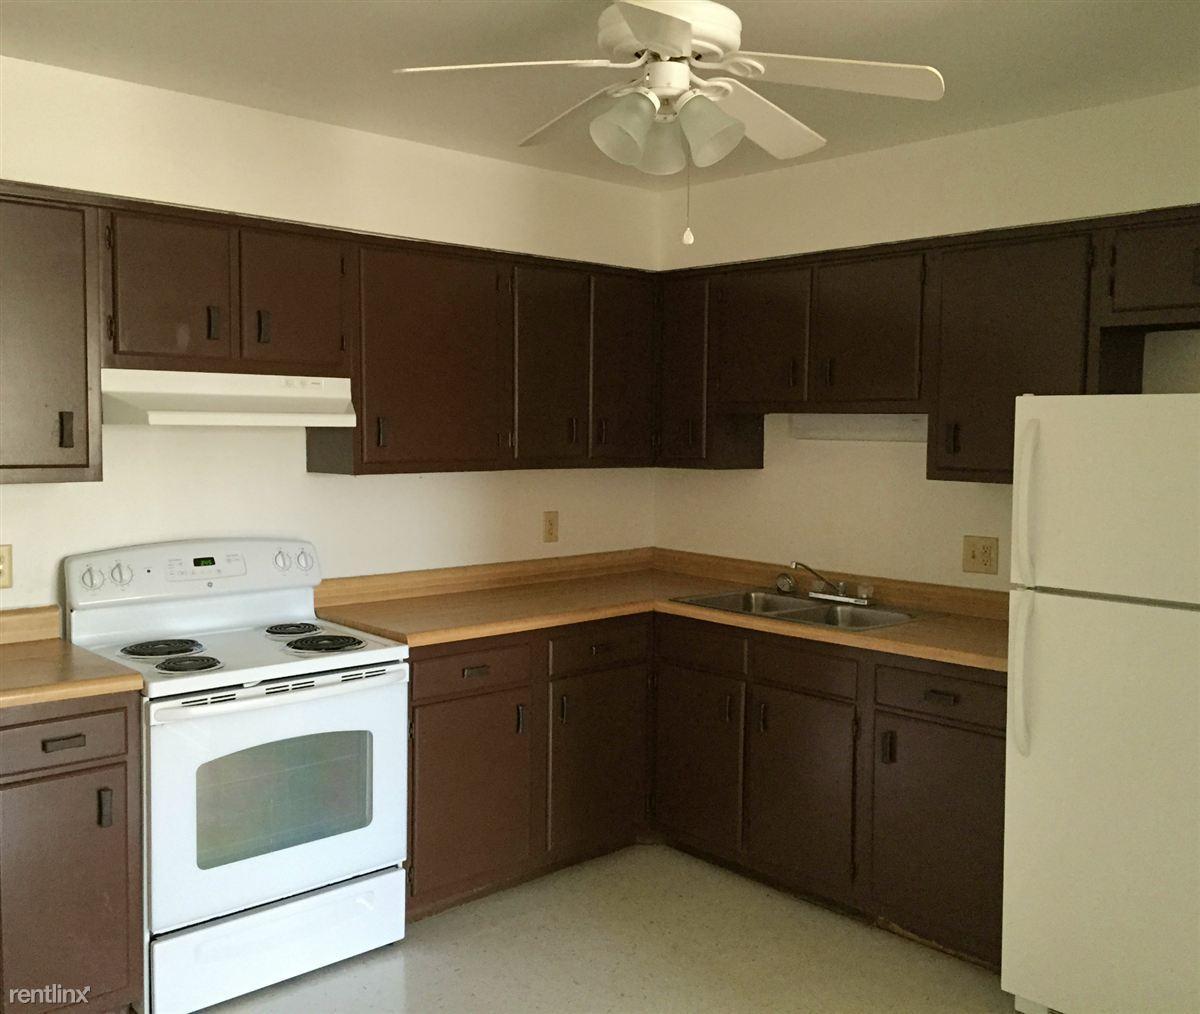 One Bedroom Apartments In Johnson City Tn: Knollridge Apartments, Greeneville TN